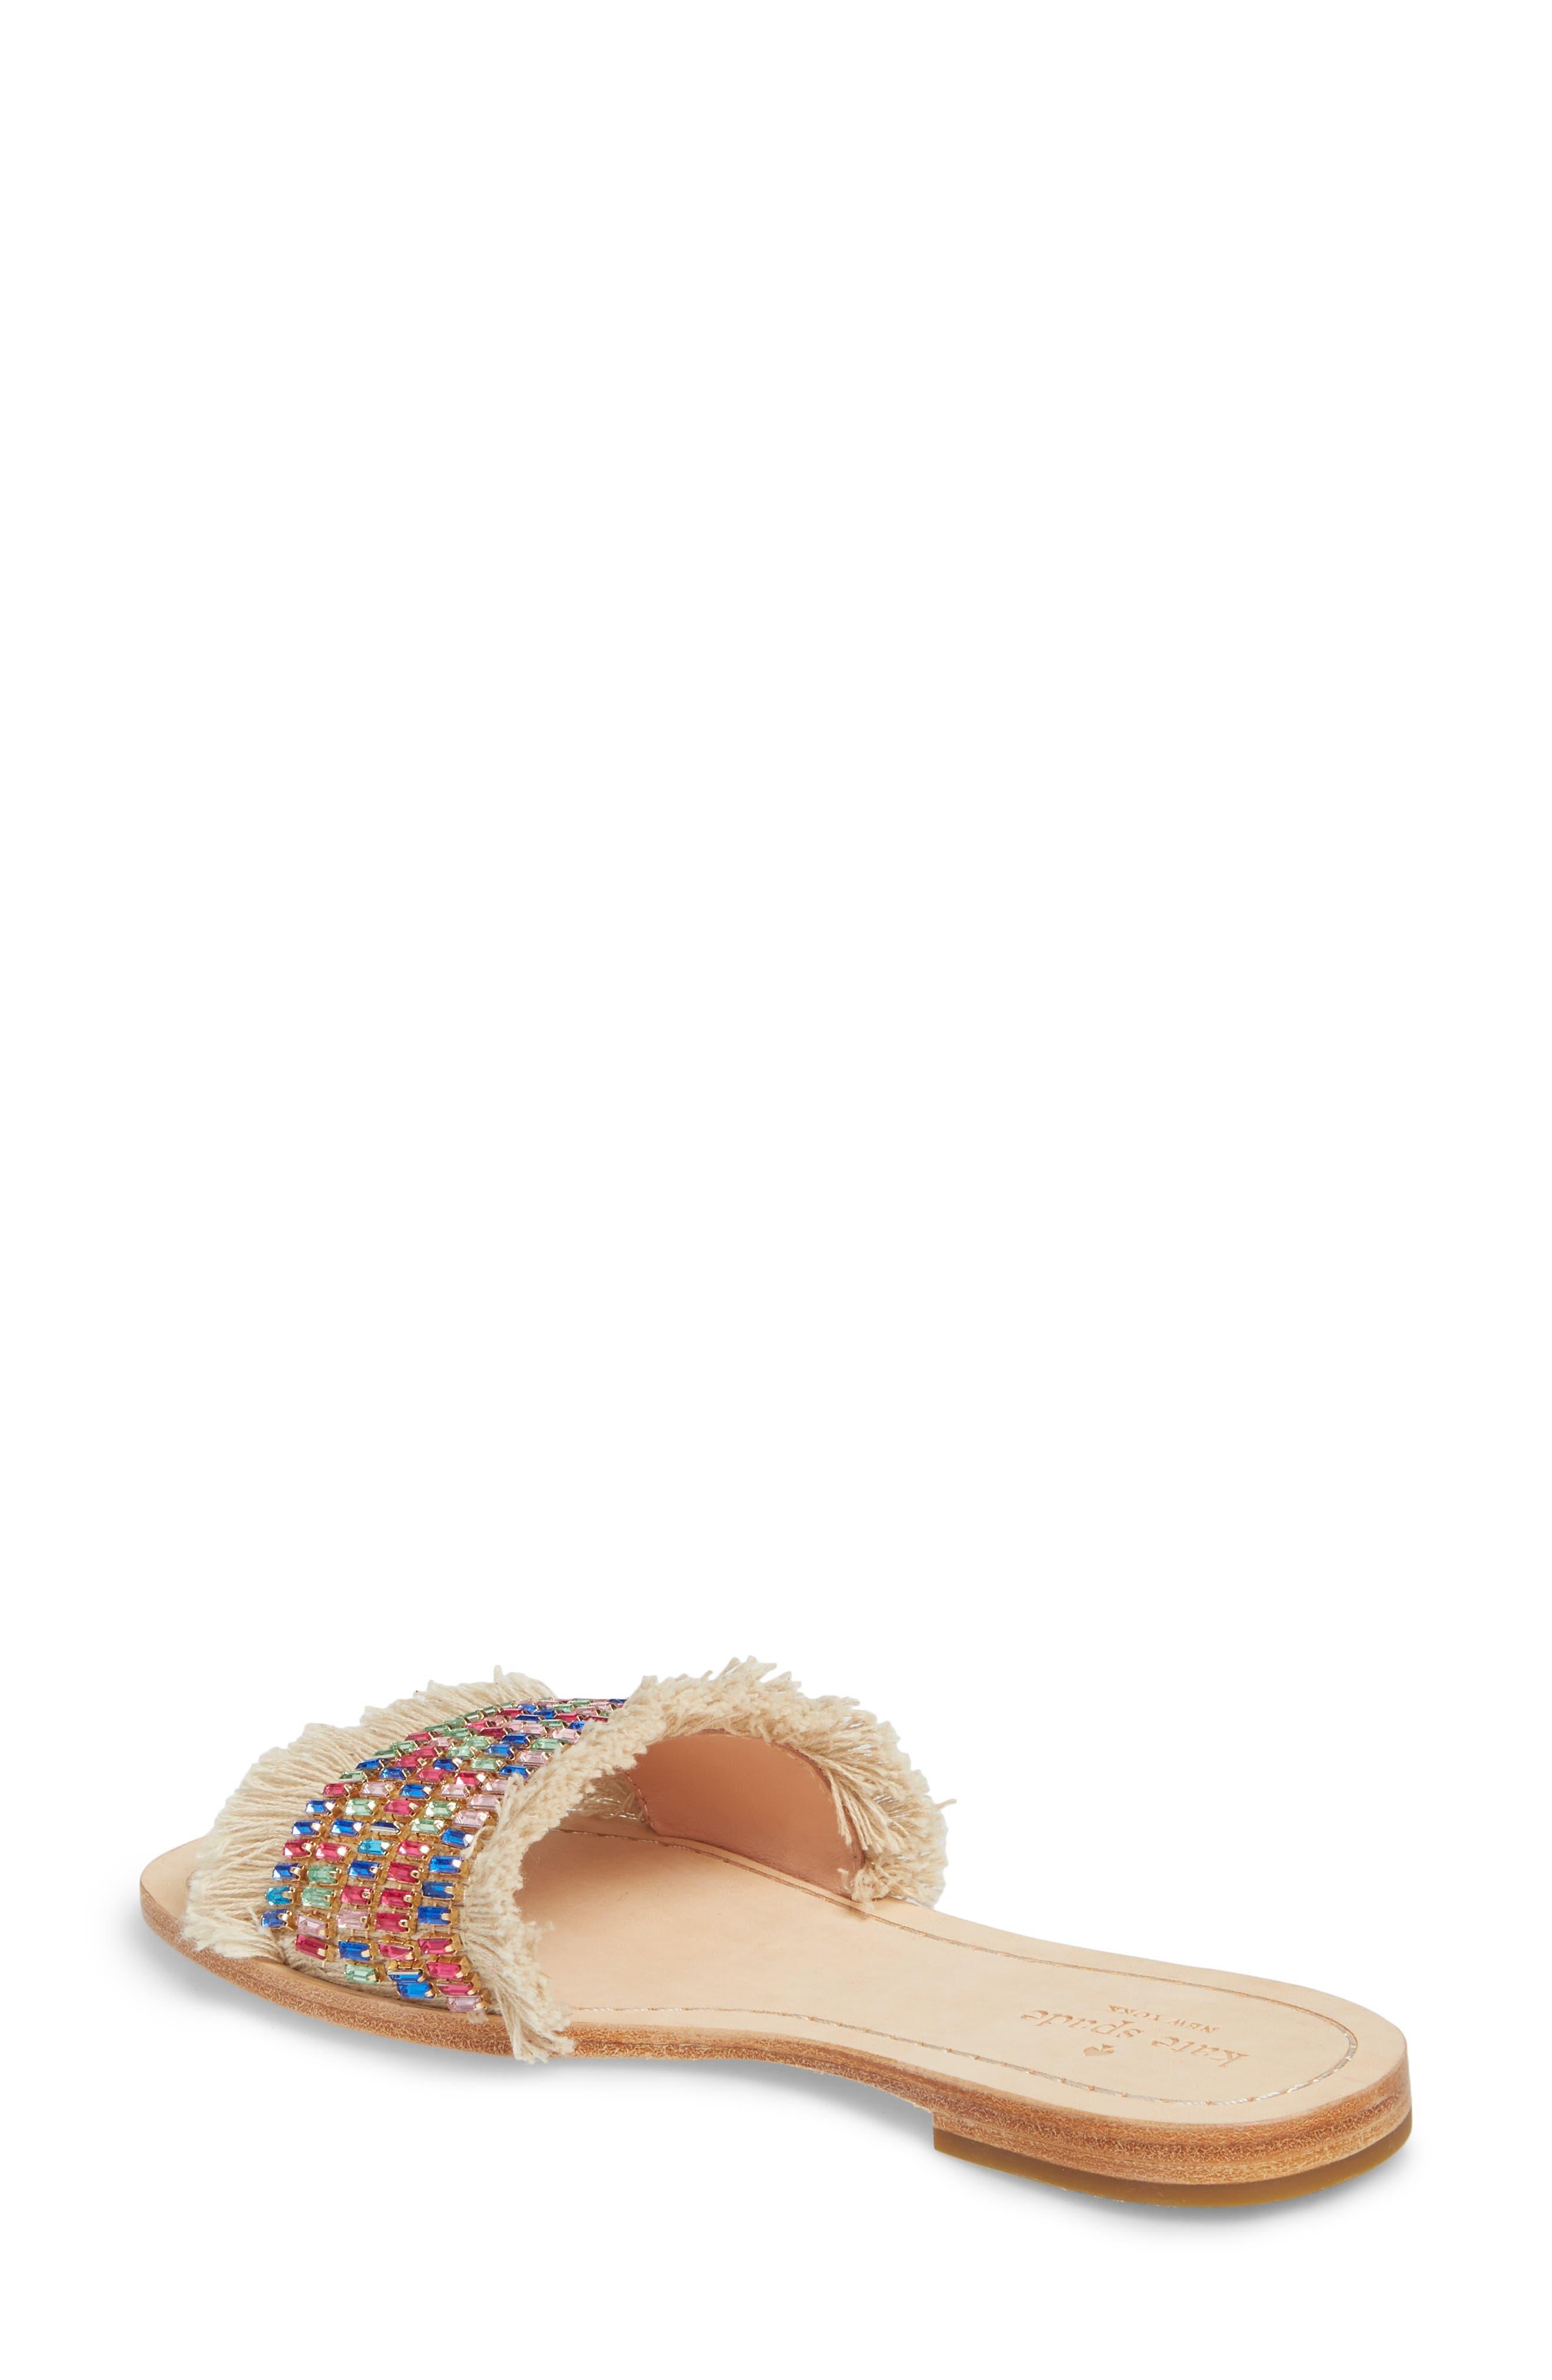 solaina slide sandal,                             Alternate thumbnail 2, color,                             Natural/ Multi